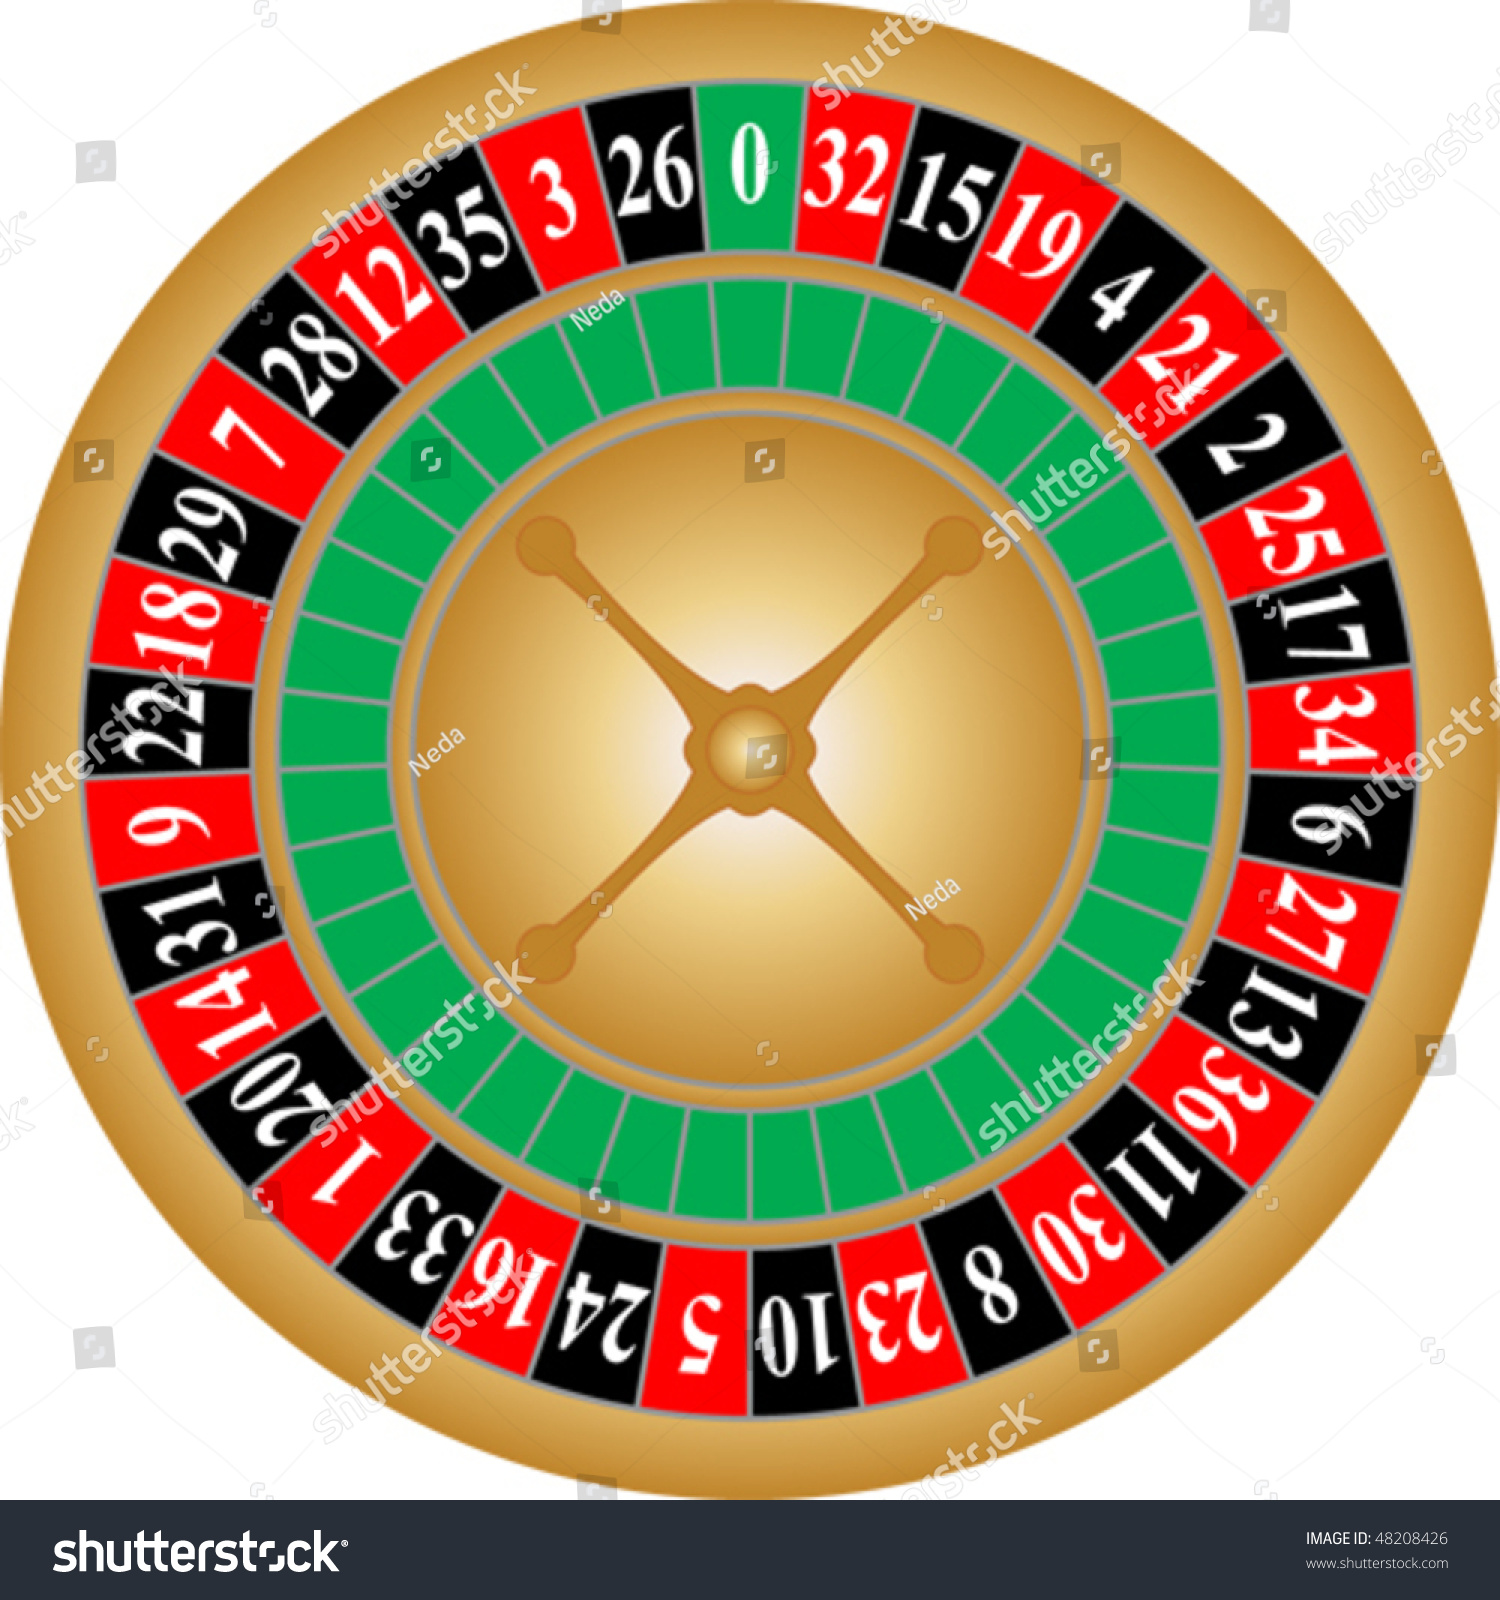 Images roulette wheel